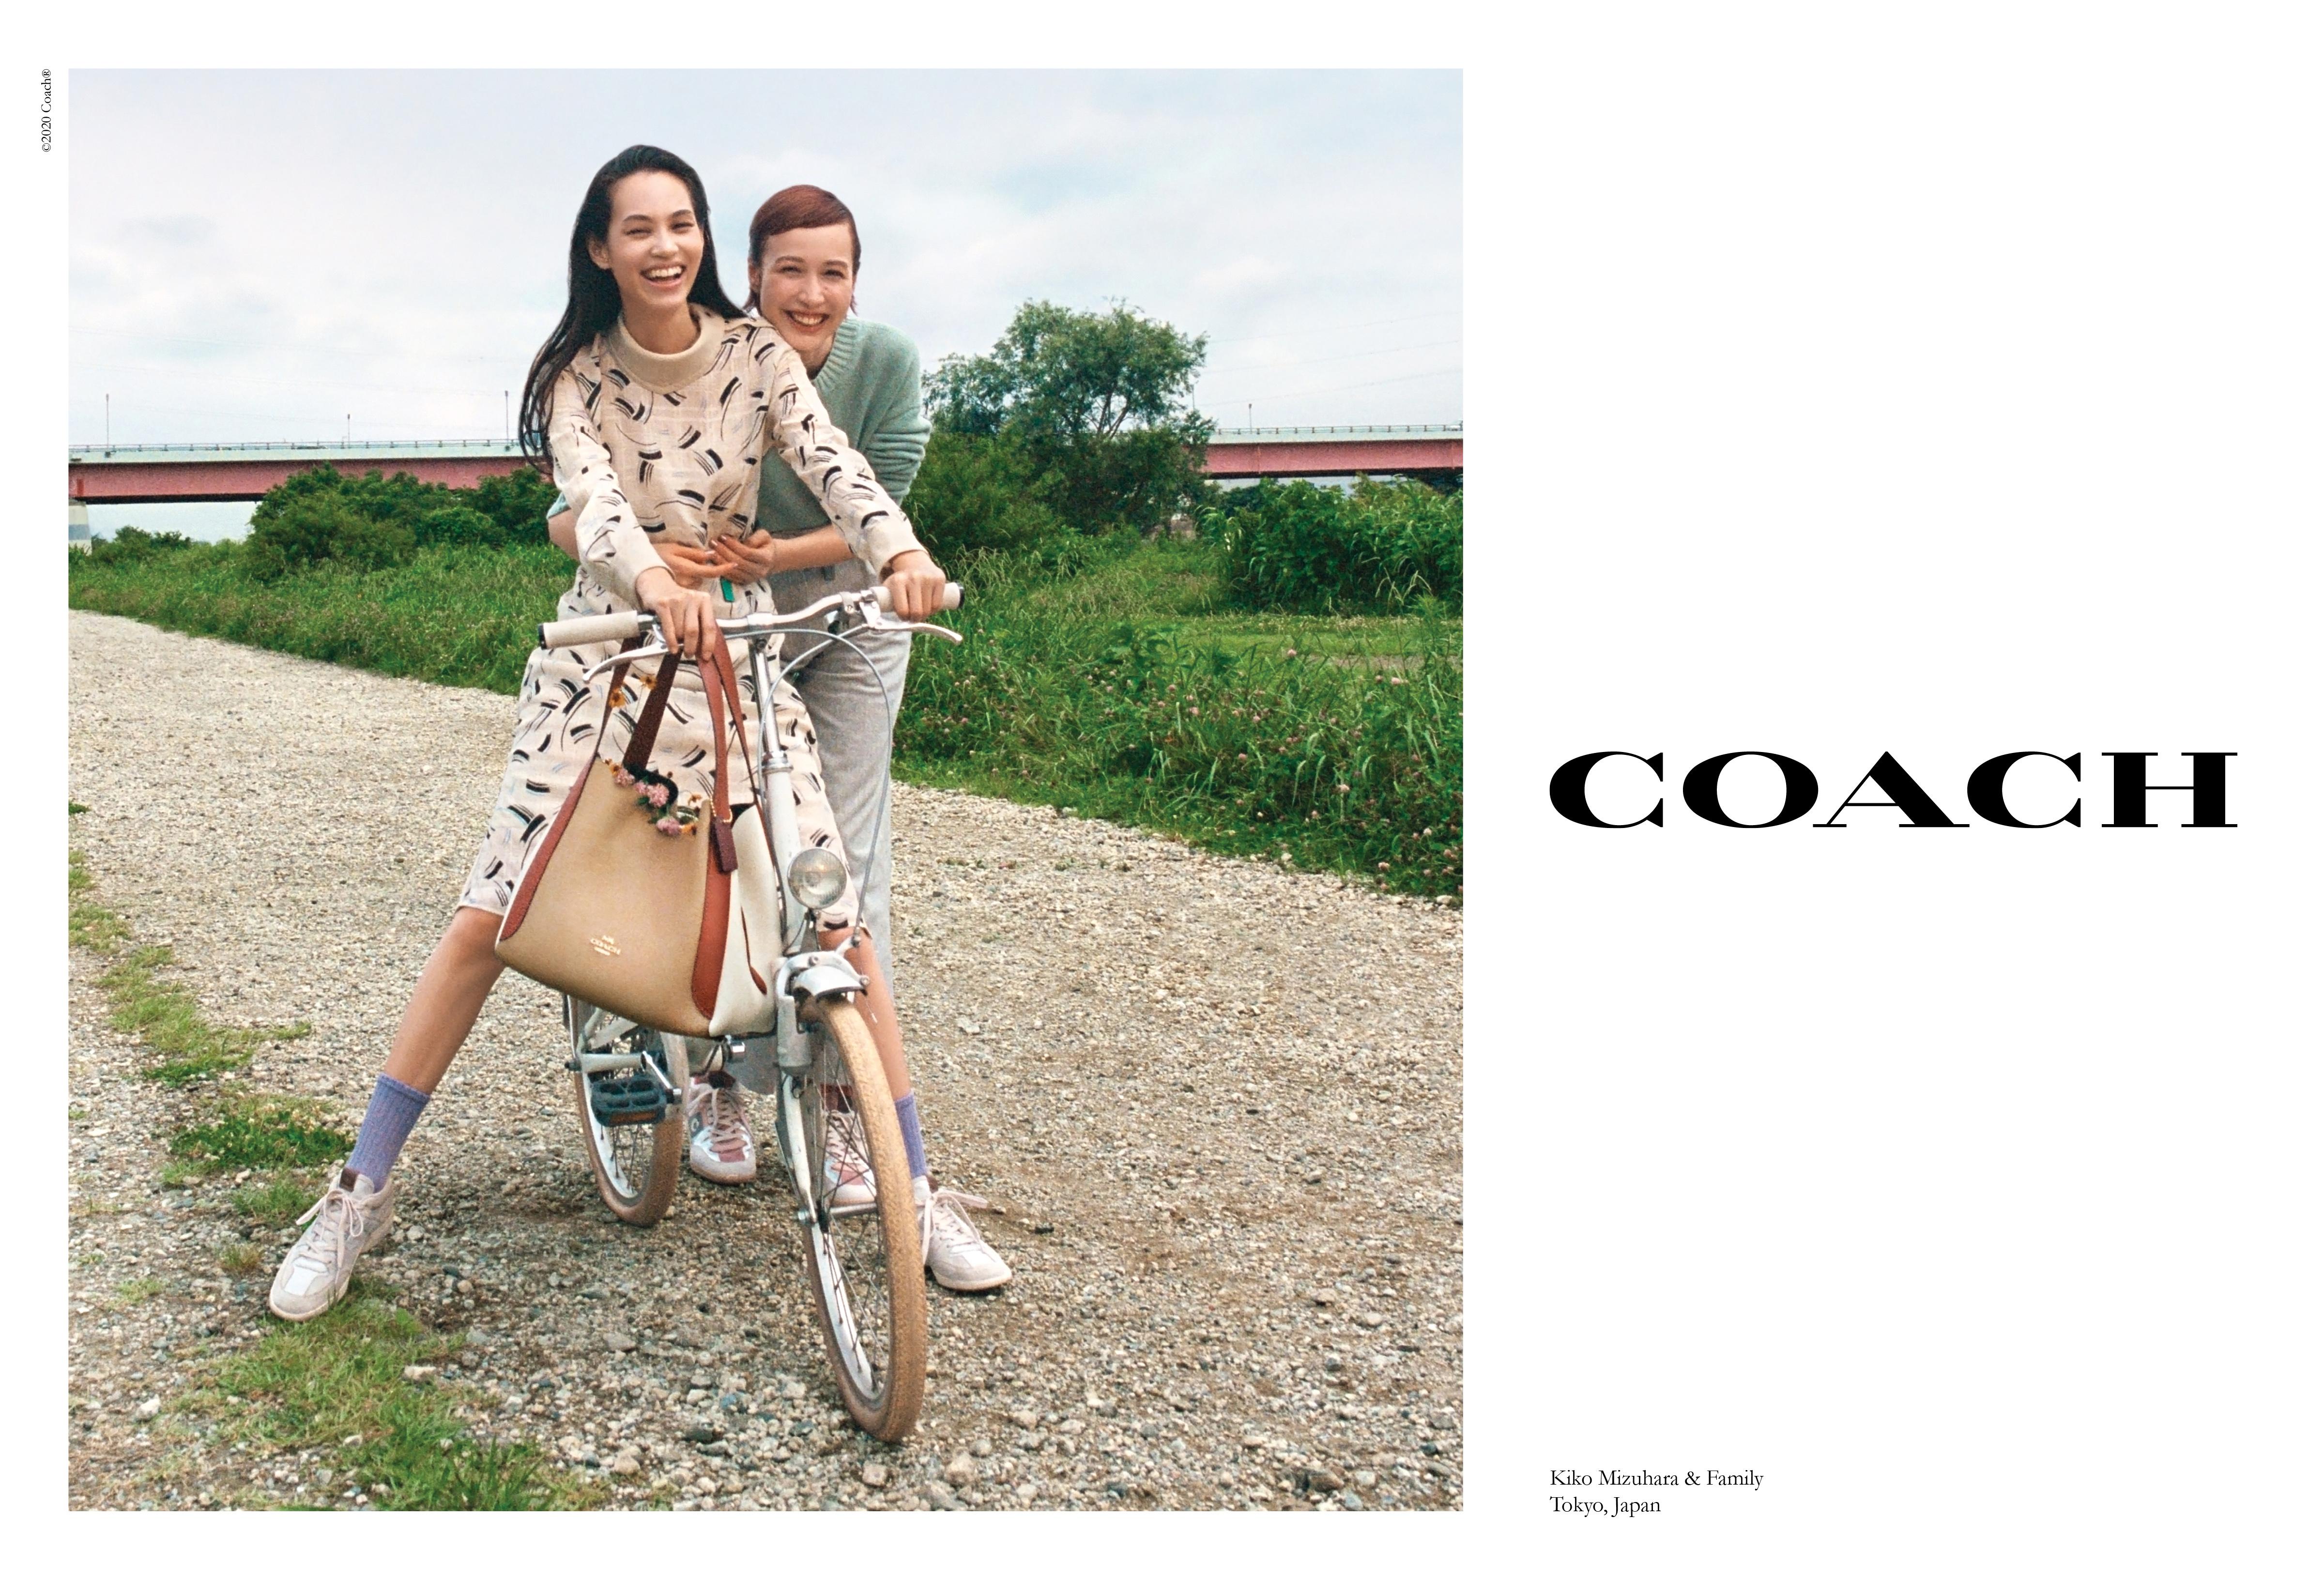 COACH Launches 'Coach Family' featuring Jennifer Lopez